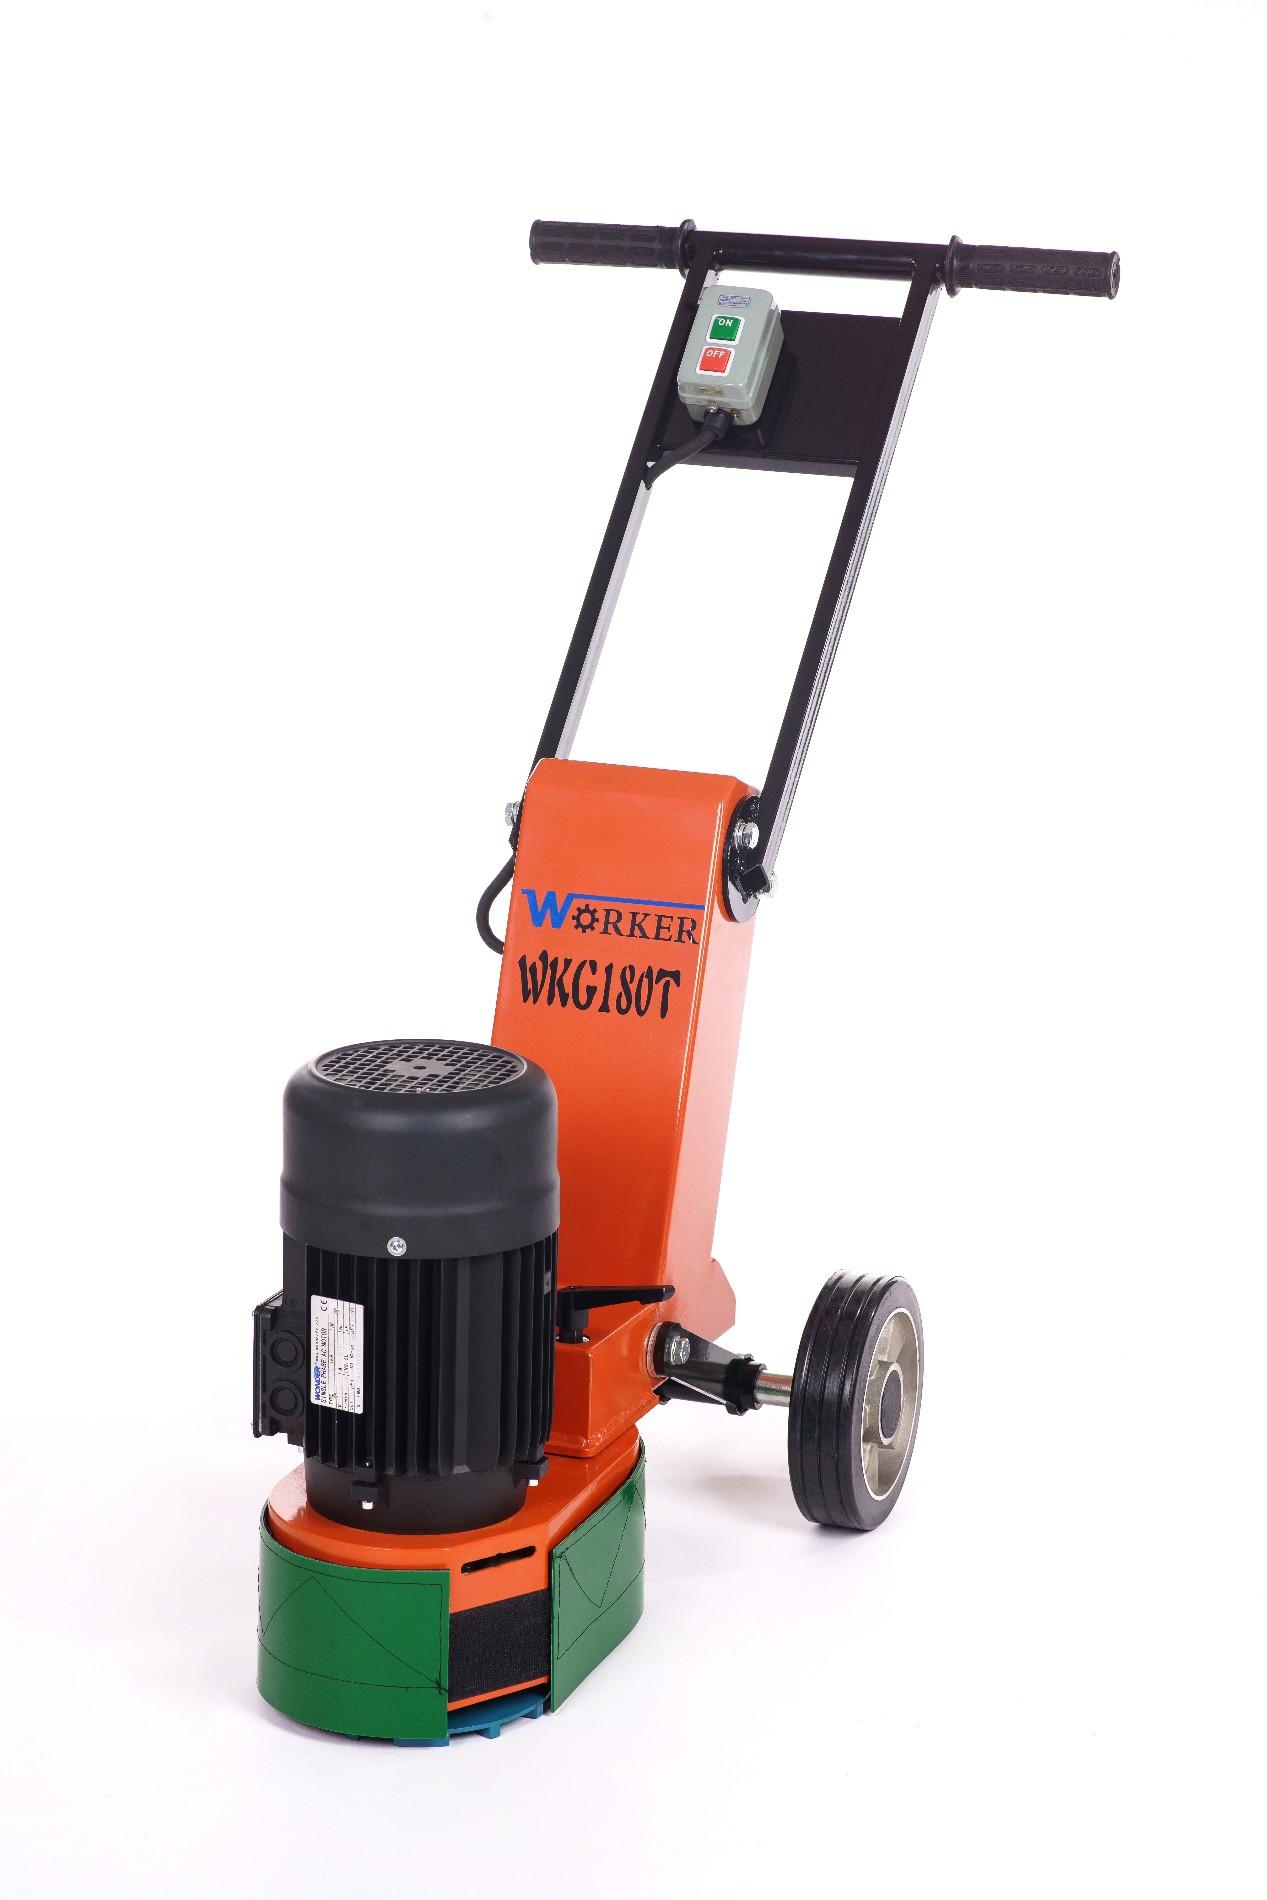 supply floor grinder polisher, china floor grinder polisher, sales floor grinder polisher, cheap floor grinder polisher, discount floor grinder polisher